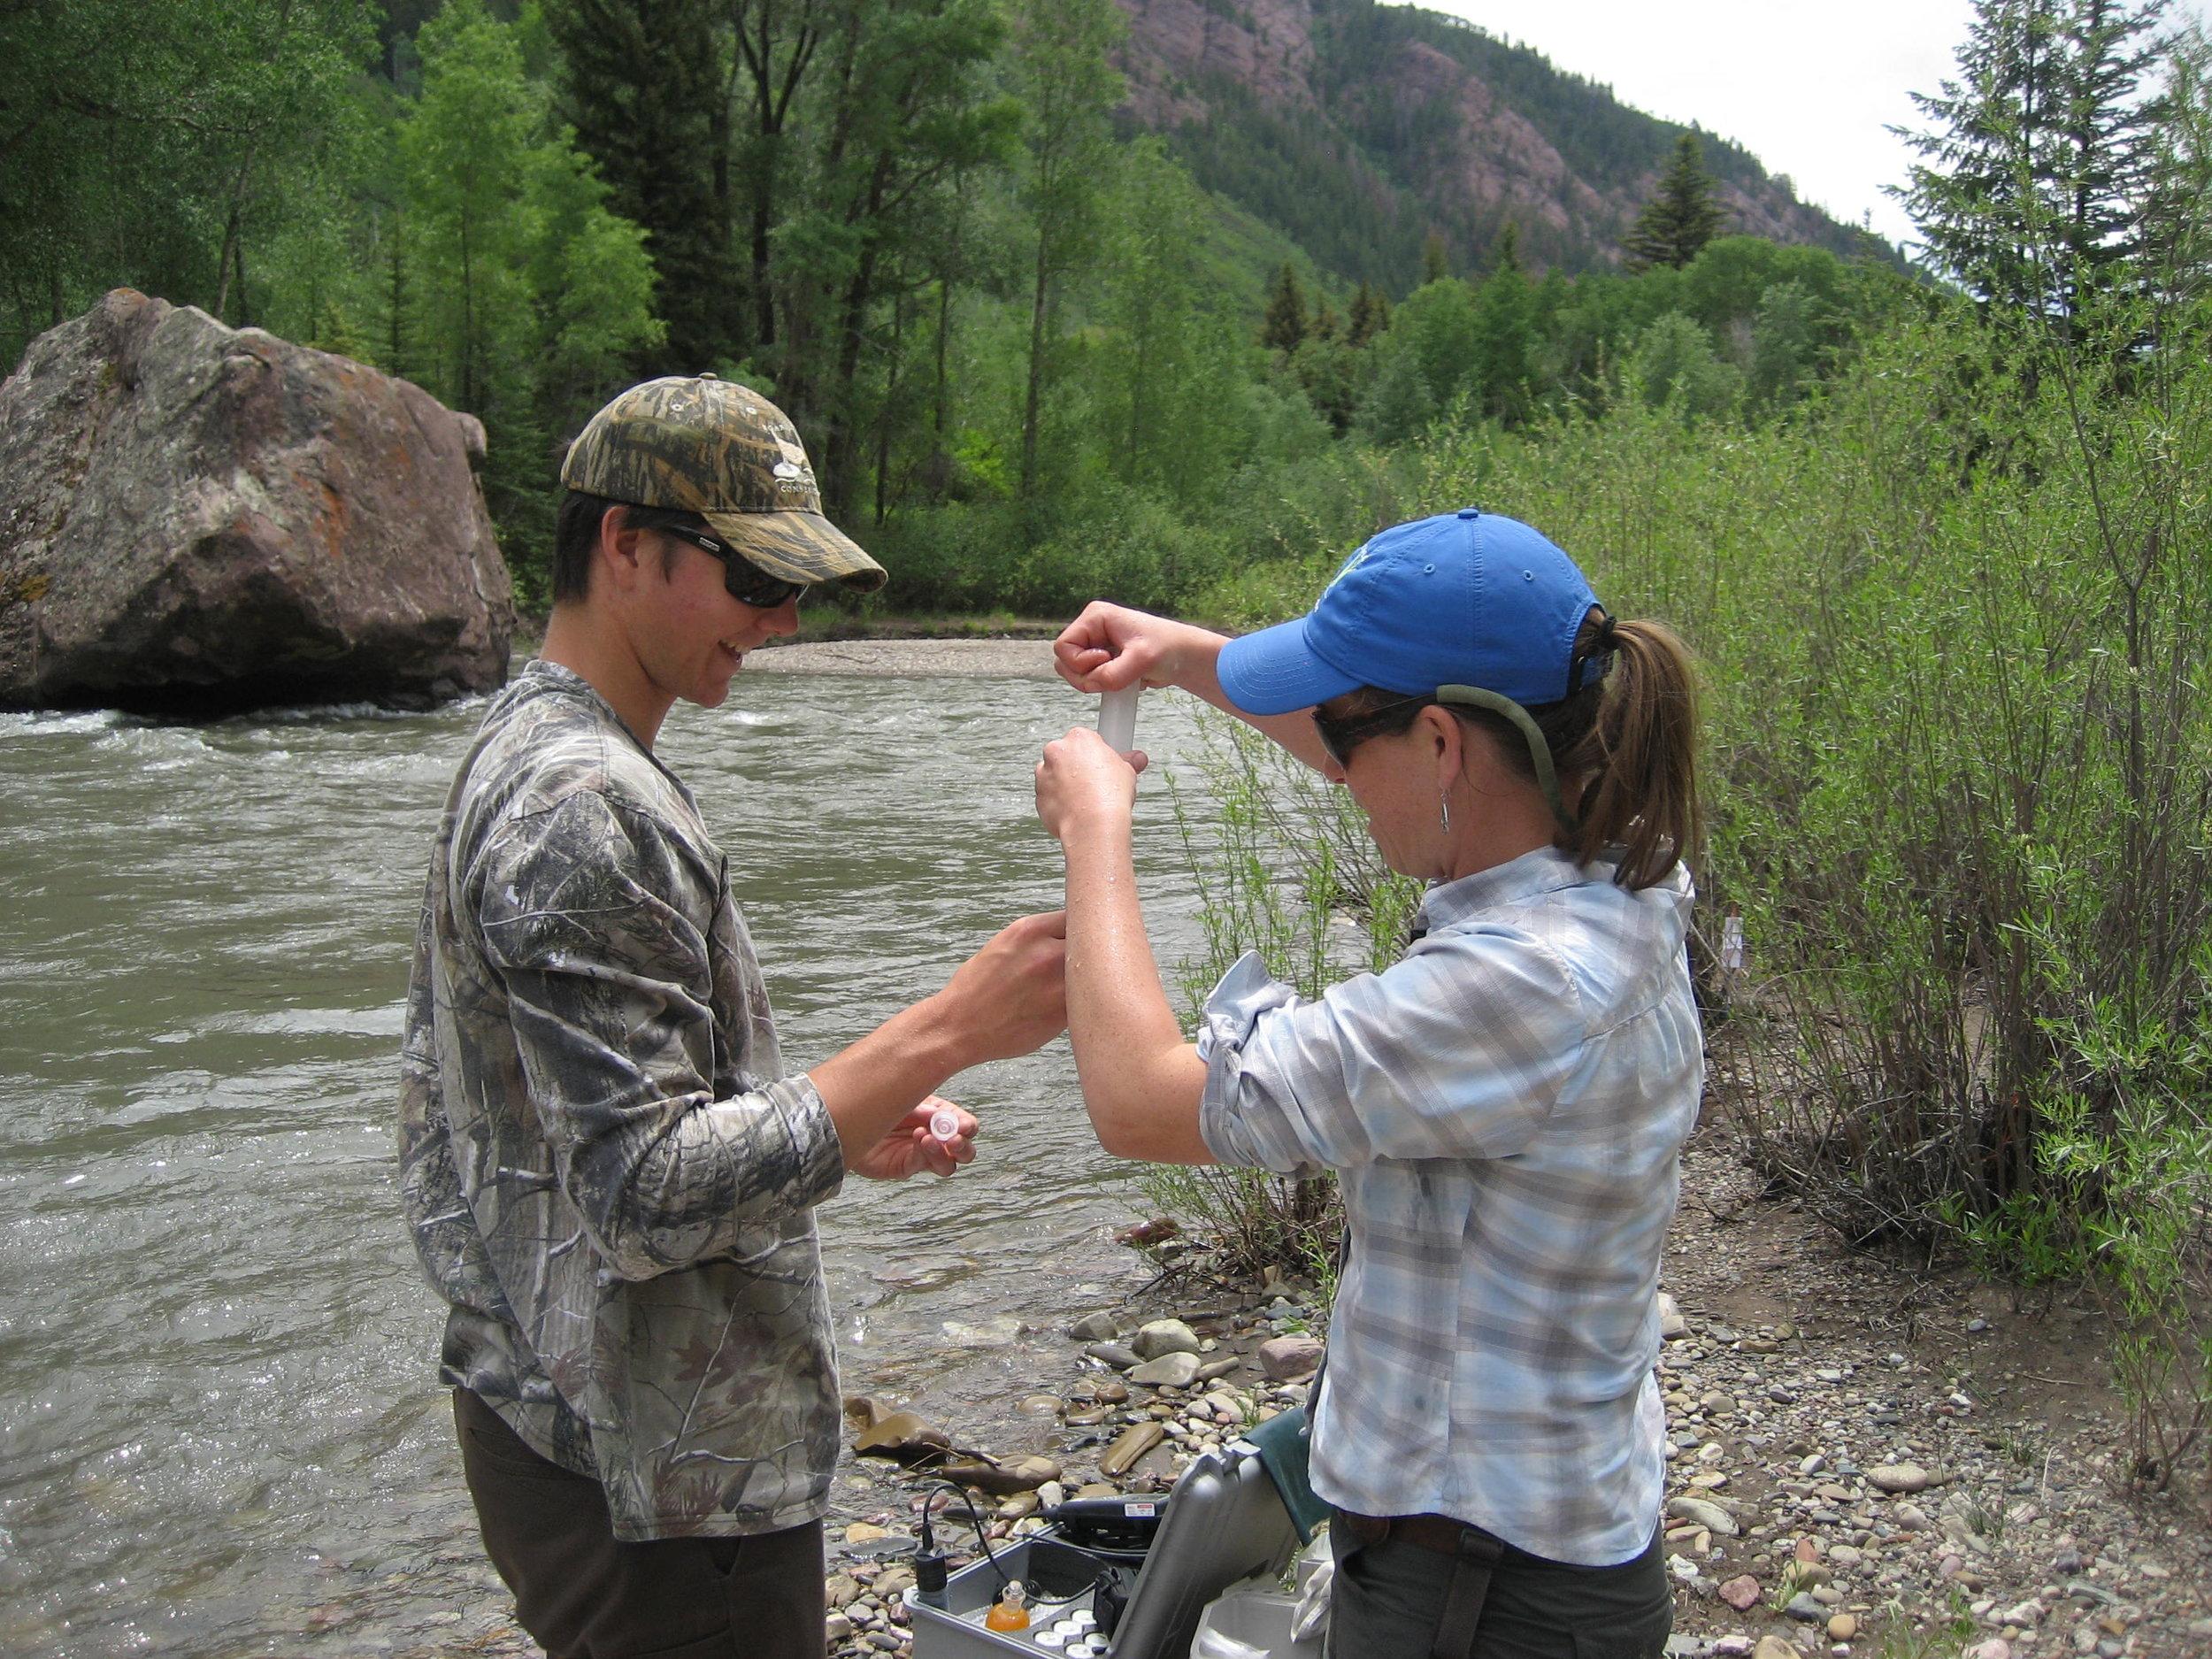 The colorado footprint - How citizen scientists are keeping Colorado waterways healthy.